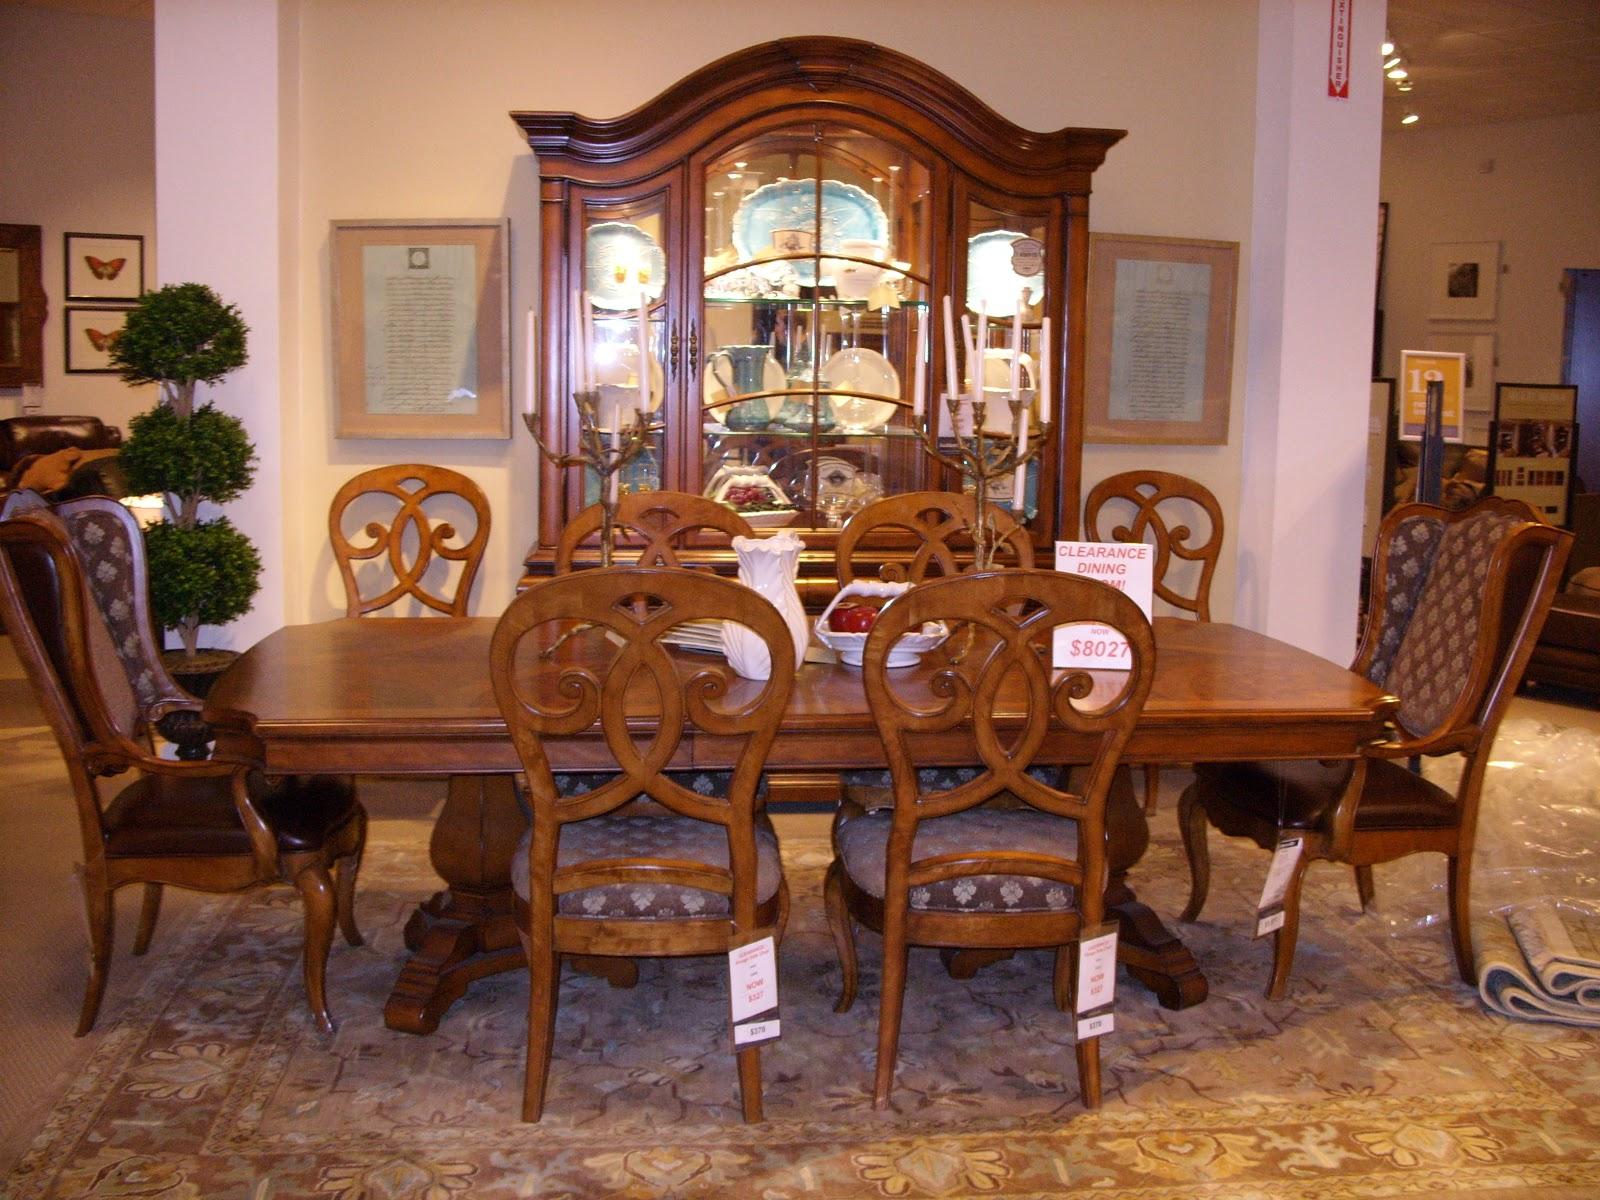 Thomasville Dining Room 50 Amazing, Used Thomasville Dining Room Set